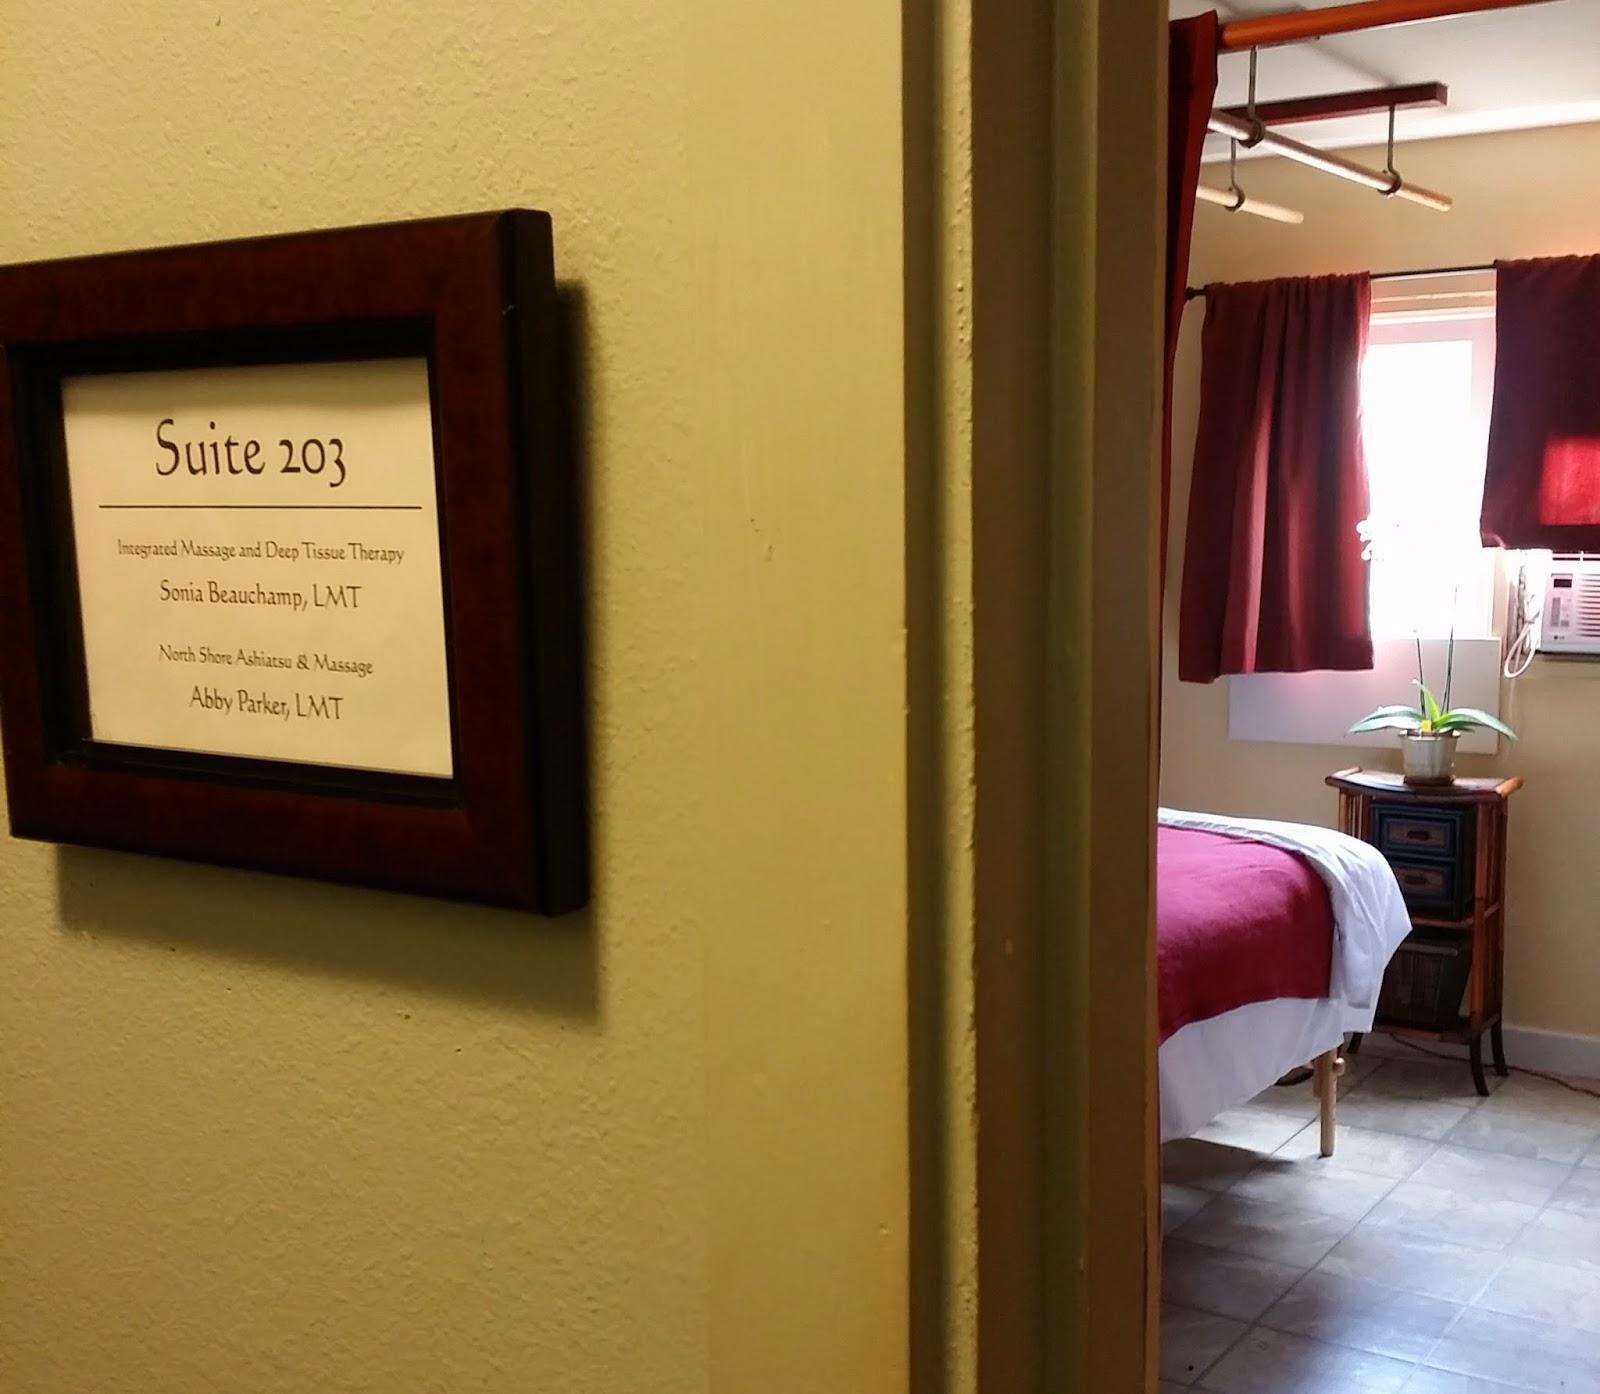 Hawaii Massage Terapi Licens